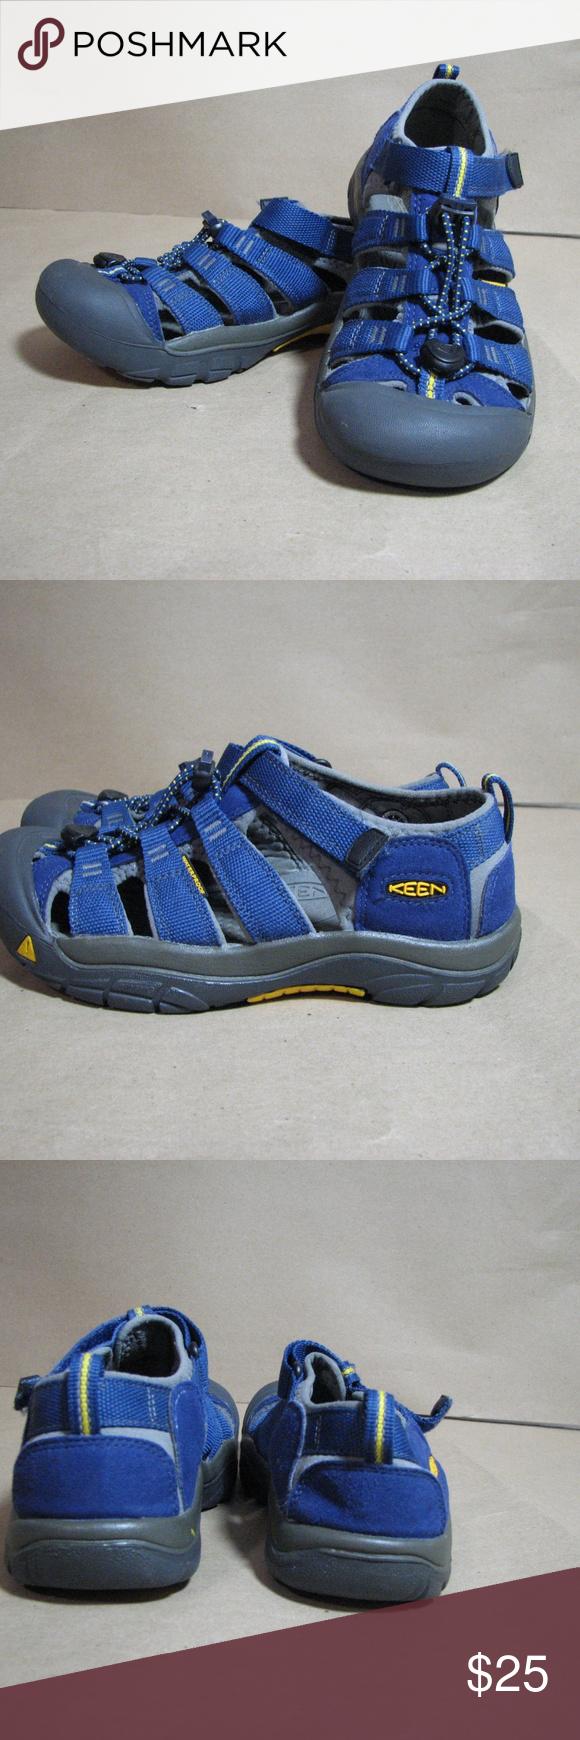 912c6c19cd05 Keen Newport H2 Blue Sandals Size 4 Excellent used condition Keen Newport  H2 sandals Great water shoes Size 4 kids (roughly 9